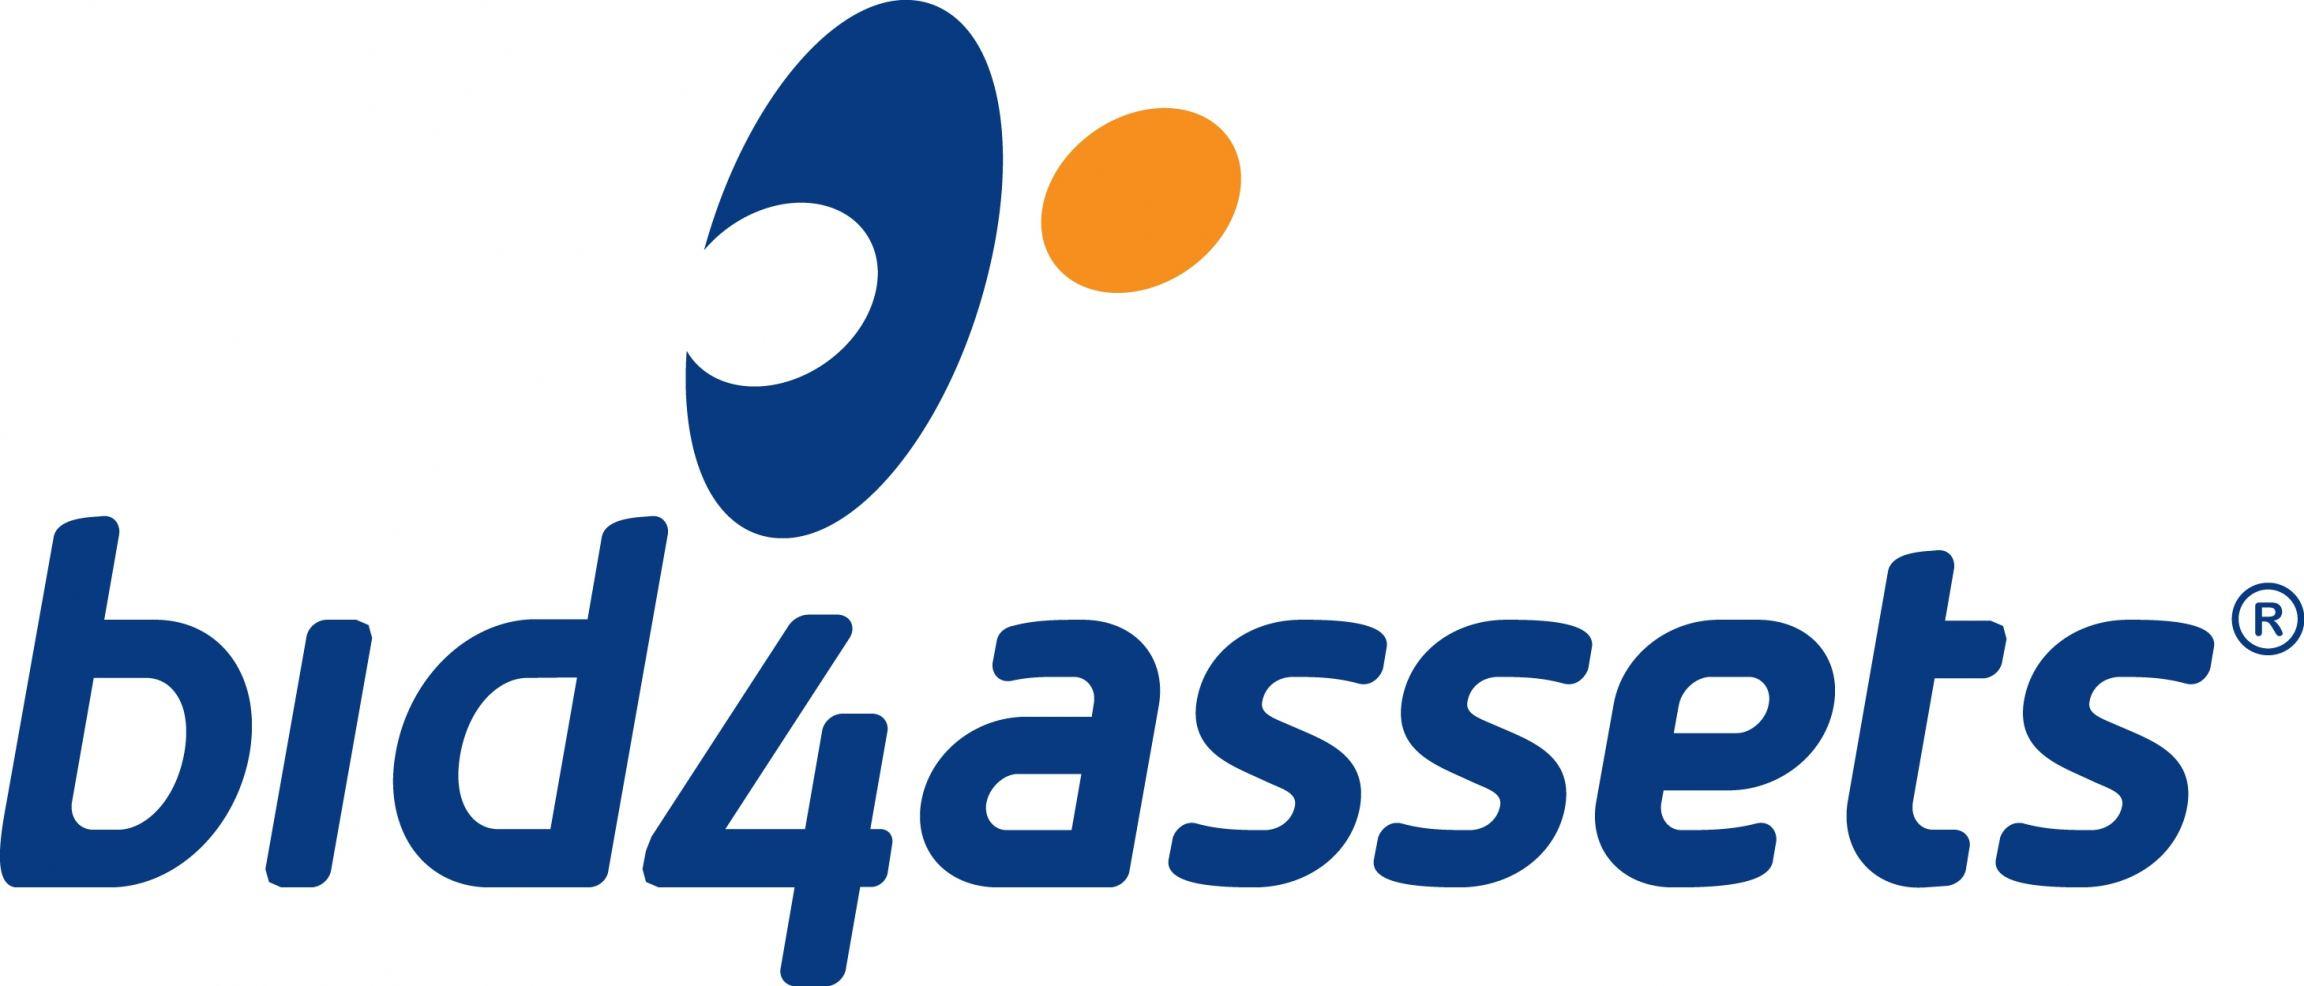 Bid4Assets Inc. Logo